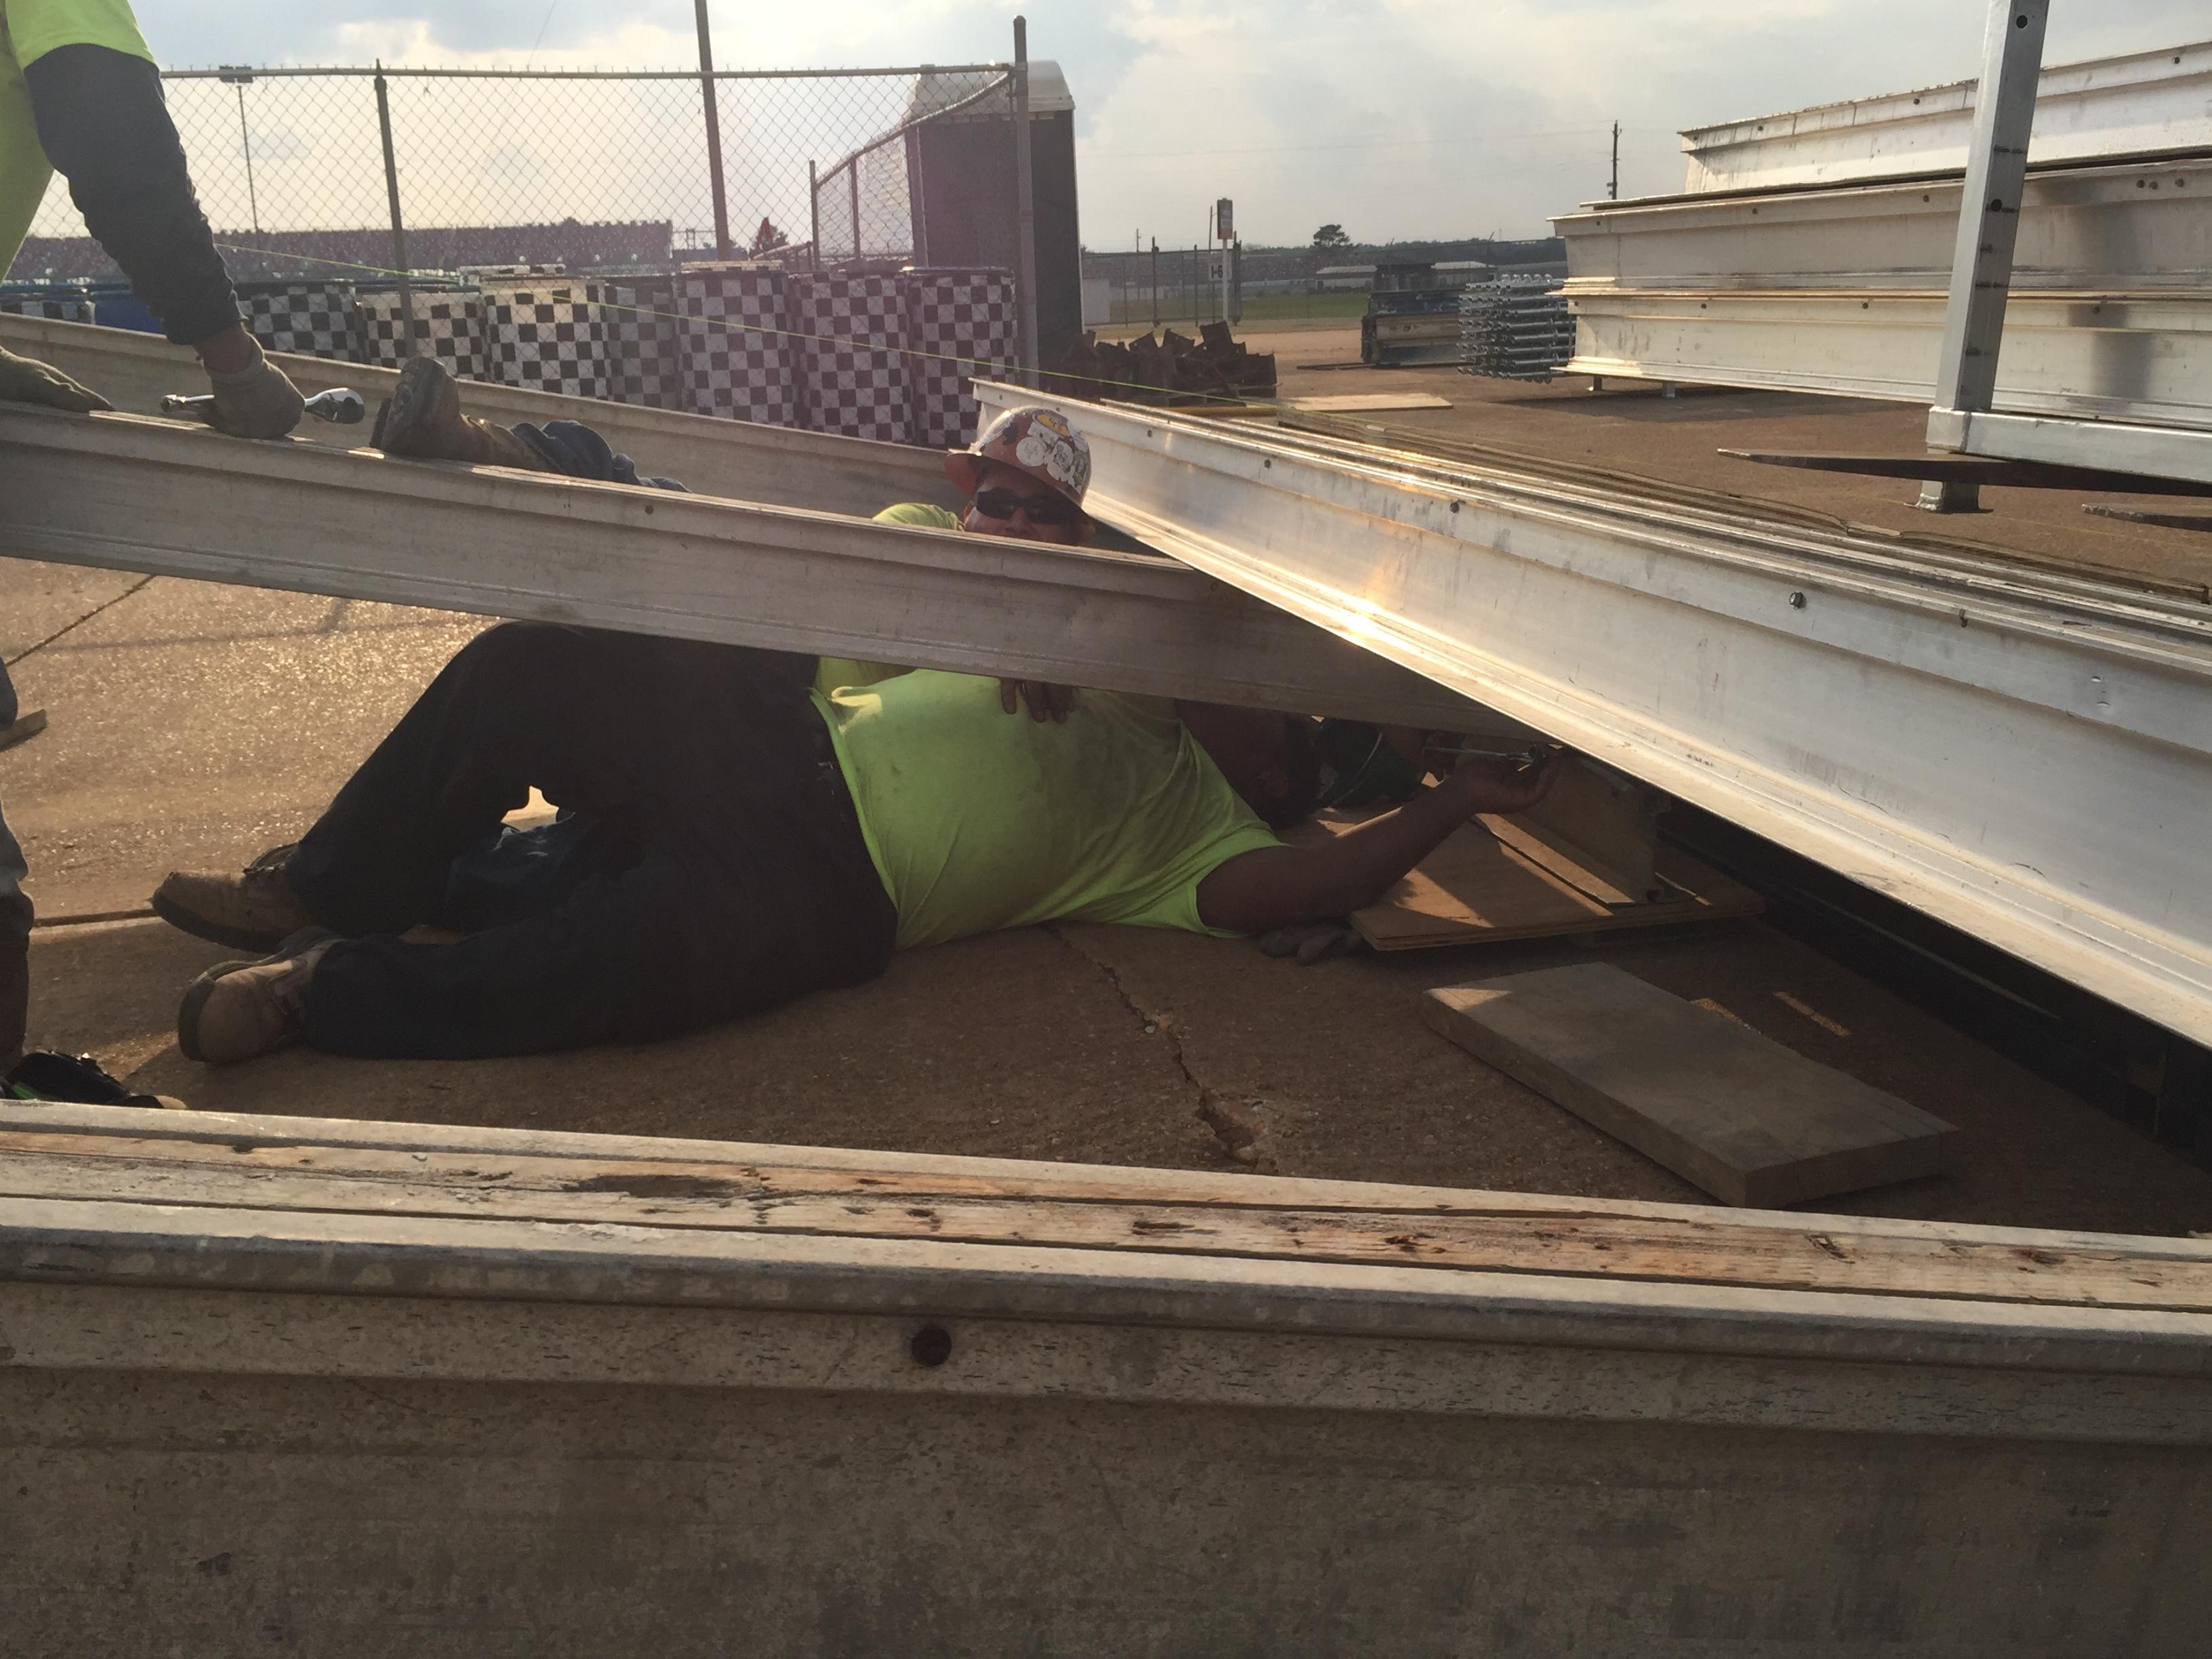 Talledega Superspeedway scaffold motorcycle ramp 7